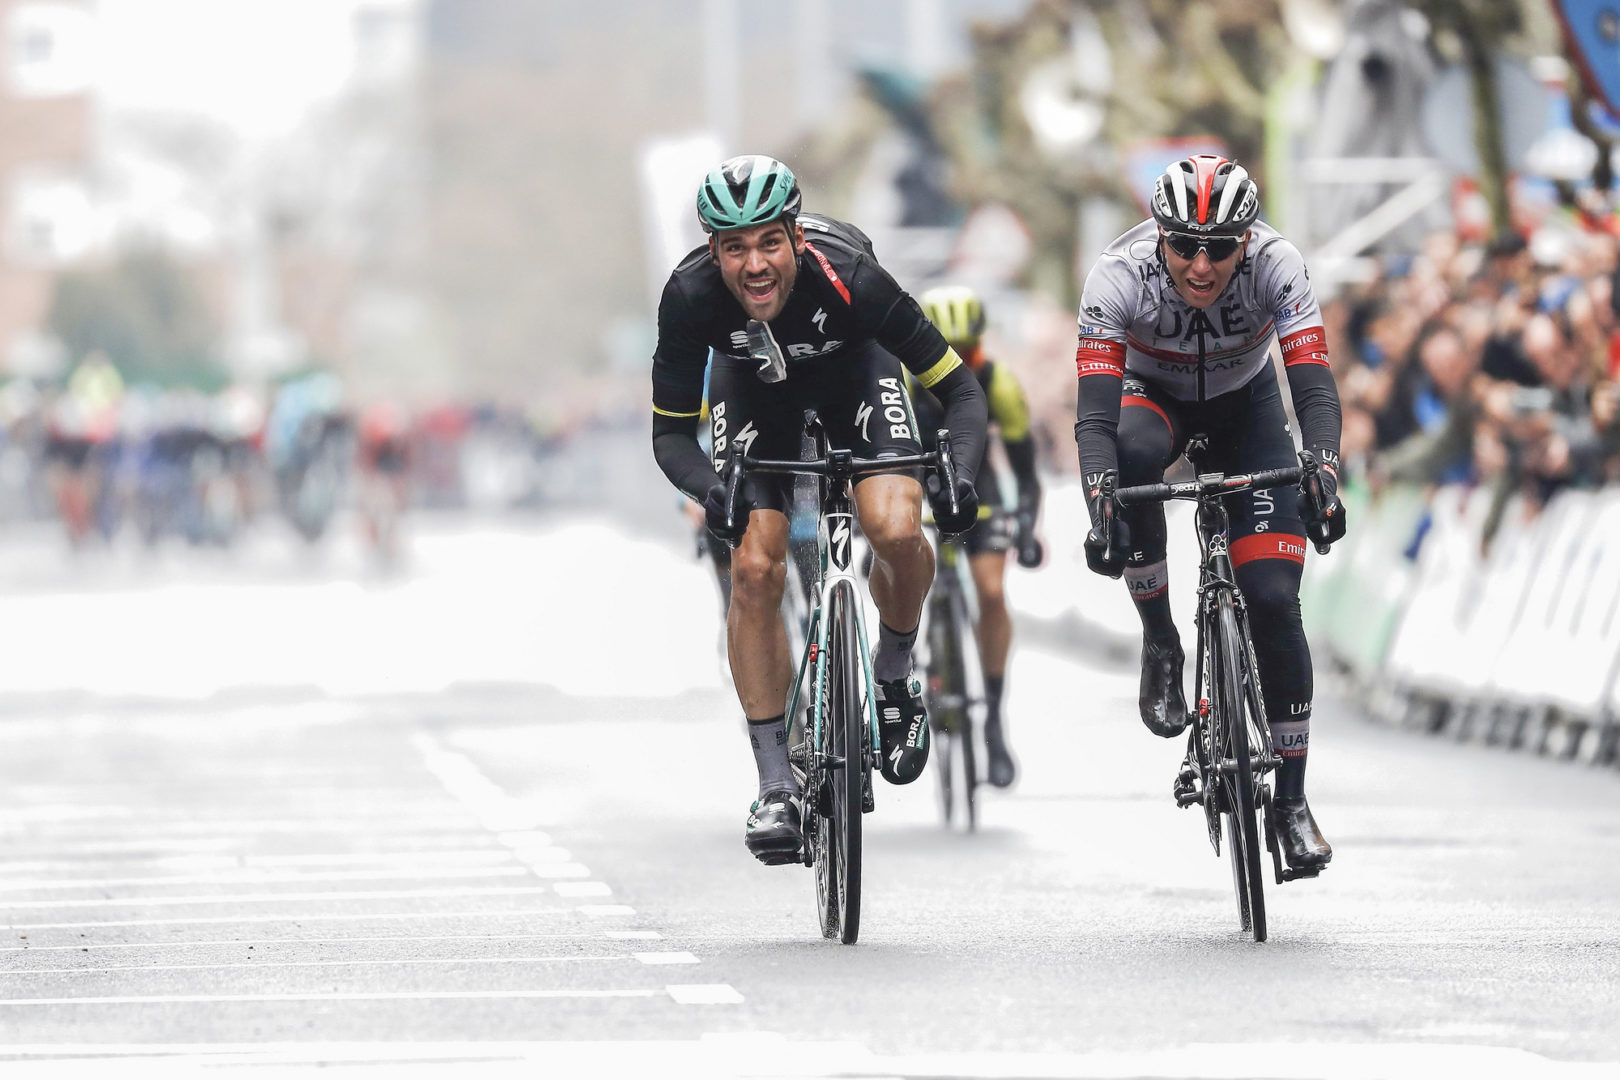 Itzulia Basque Country 2019 - 59th Edition - 4th stage Vitoria Gasteiz - Arrigorriaga 163,6 km - 11/04/2019 - Maximilian Schachmann (GER - Bora - Hansgrohe) - Tadej Pogacar (SLO - UAE - Team Emirates) - photo Luis Angel Gomez/BettiniPhoto©2019